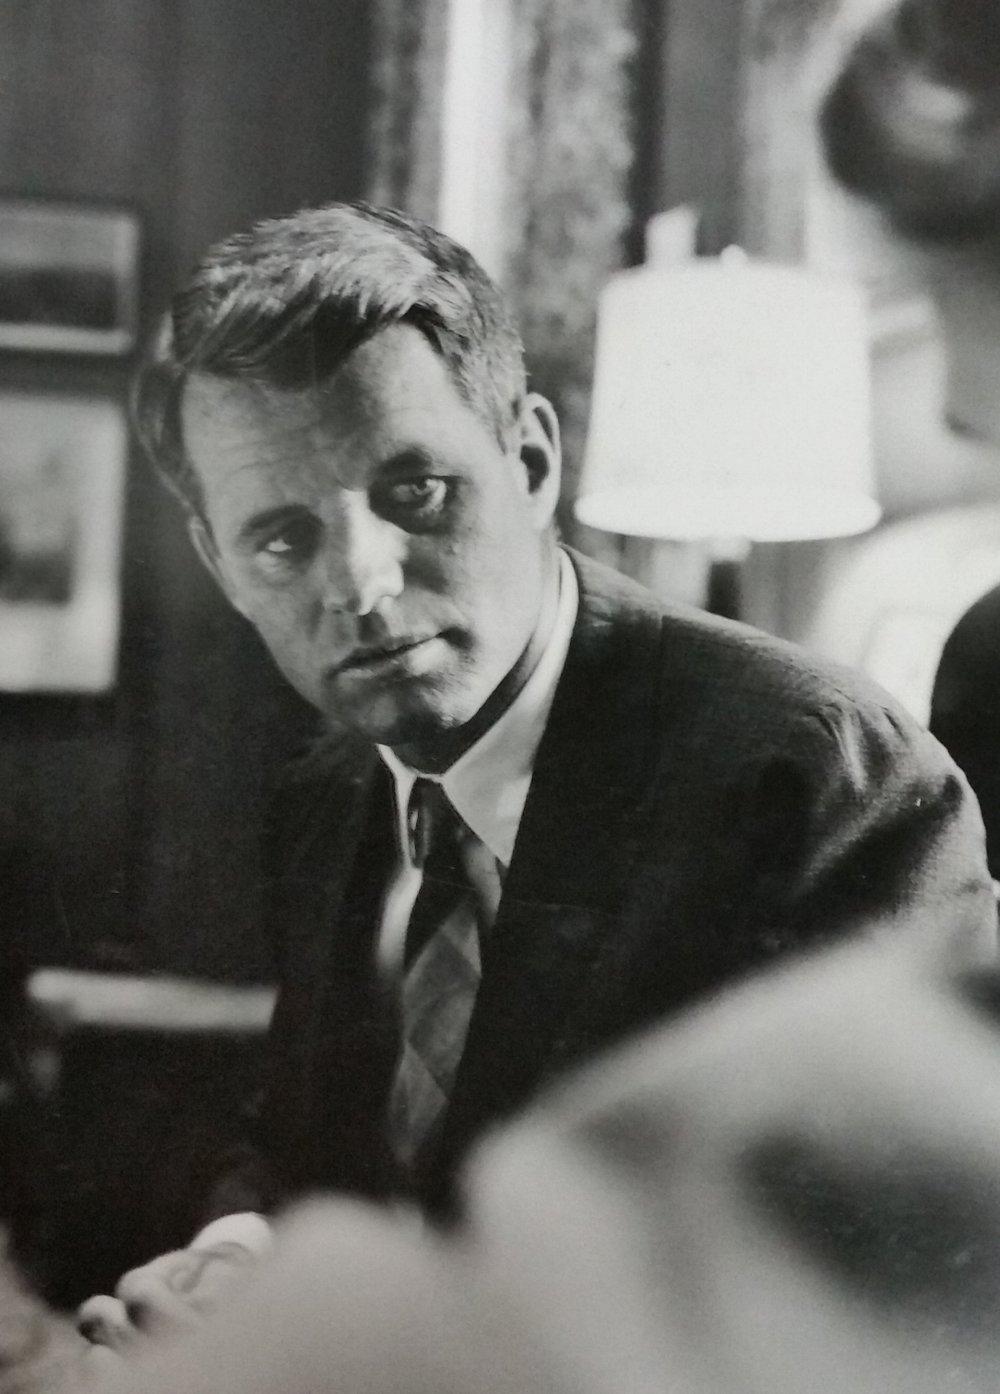 Robert F. Kennedy, US Attorney General, Washington, DC, 1963